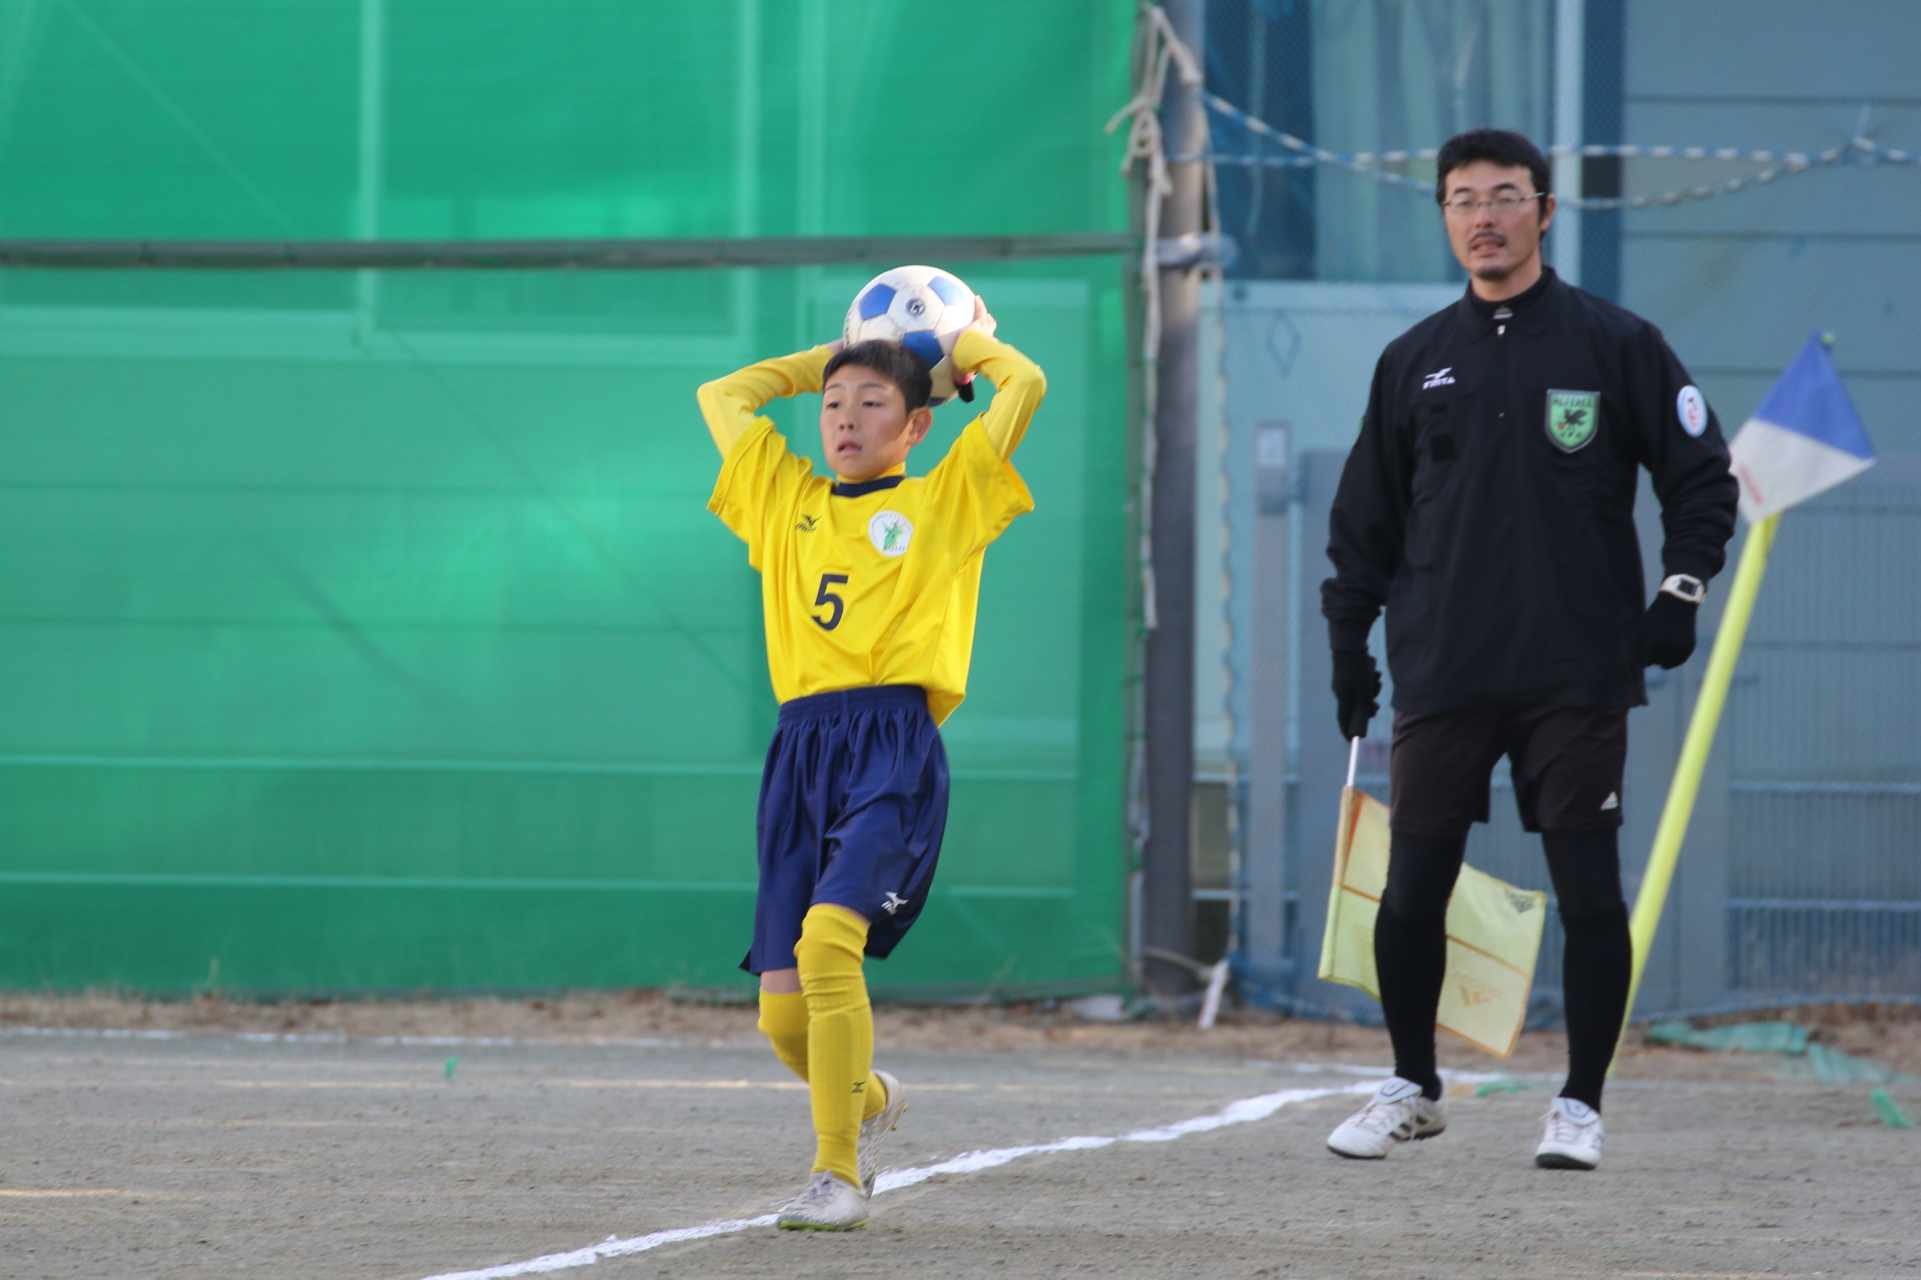 2019.1.6 U13選手権@緑町中学校